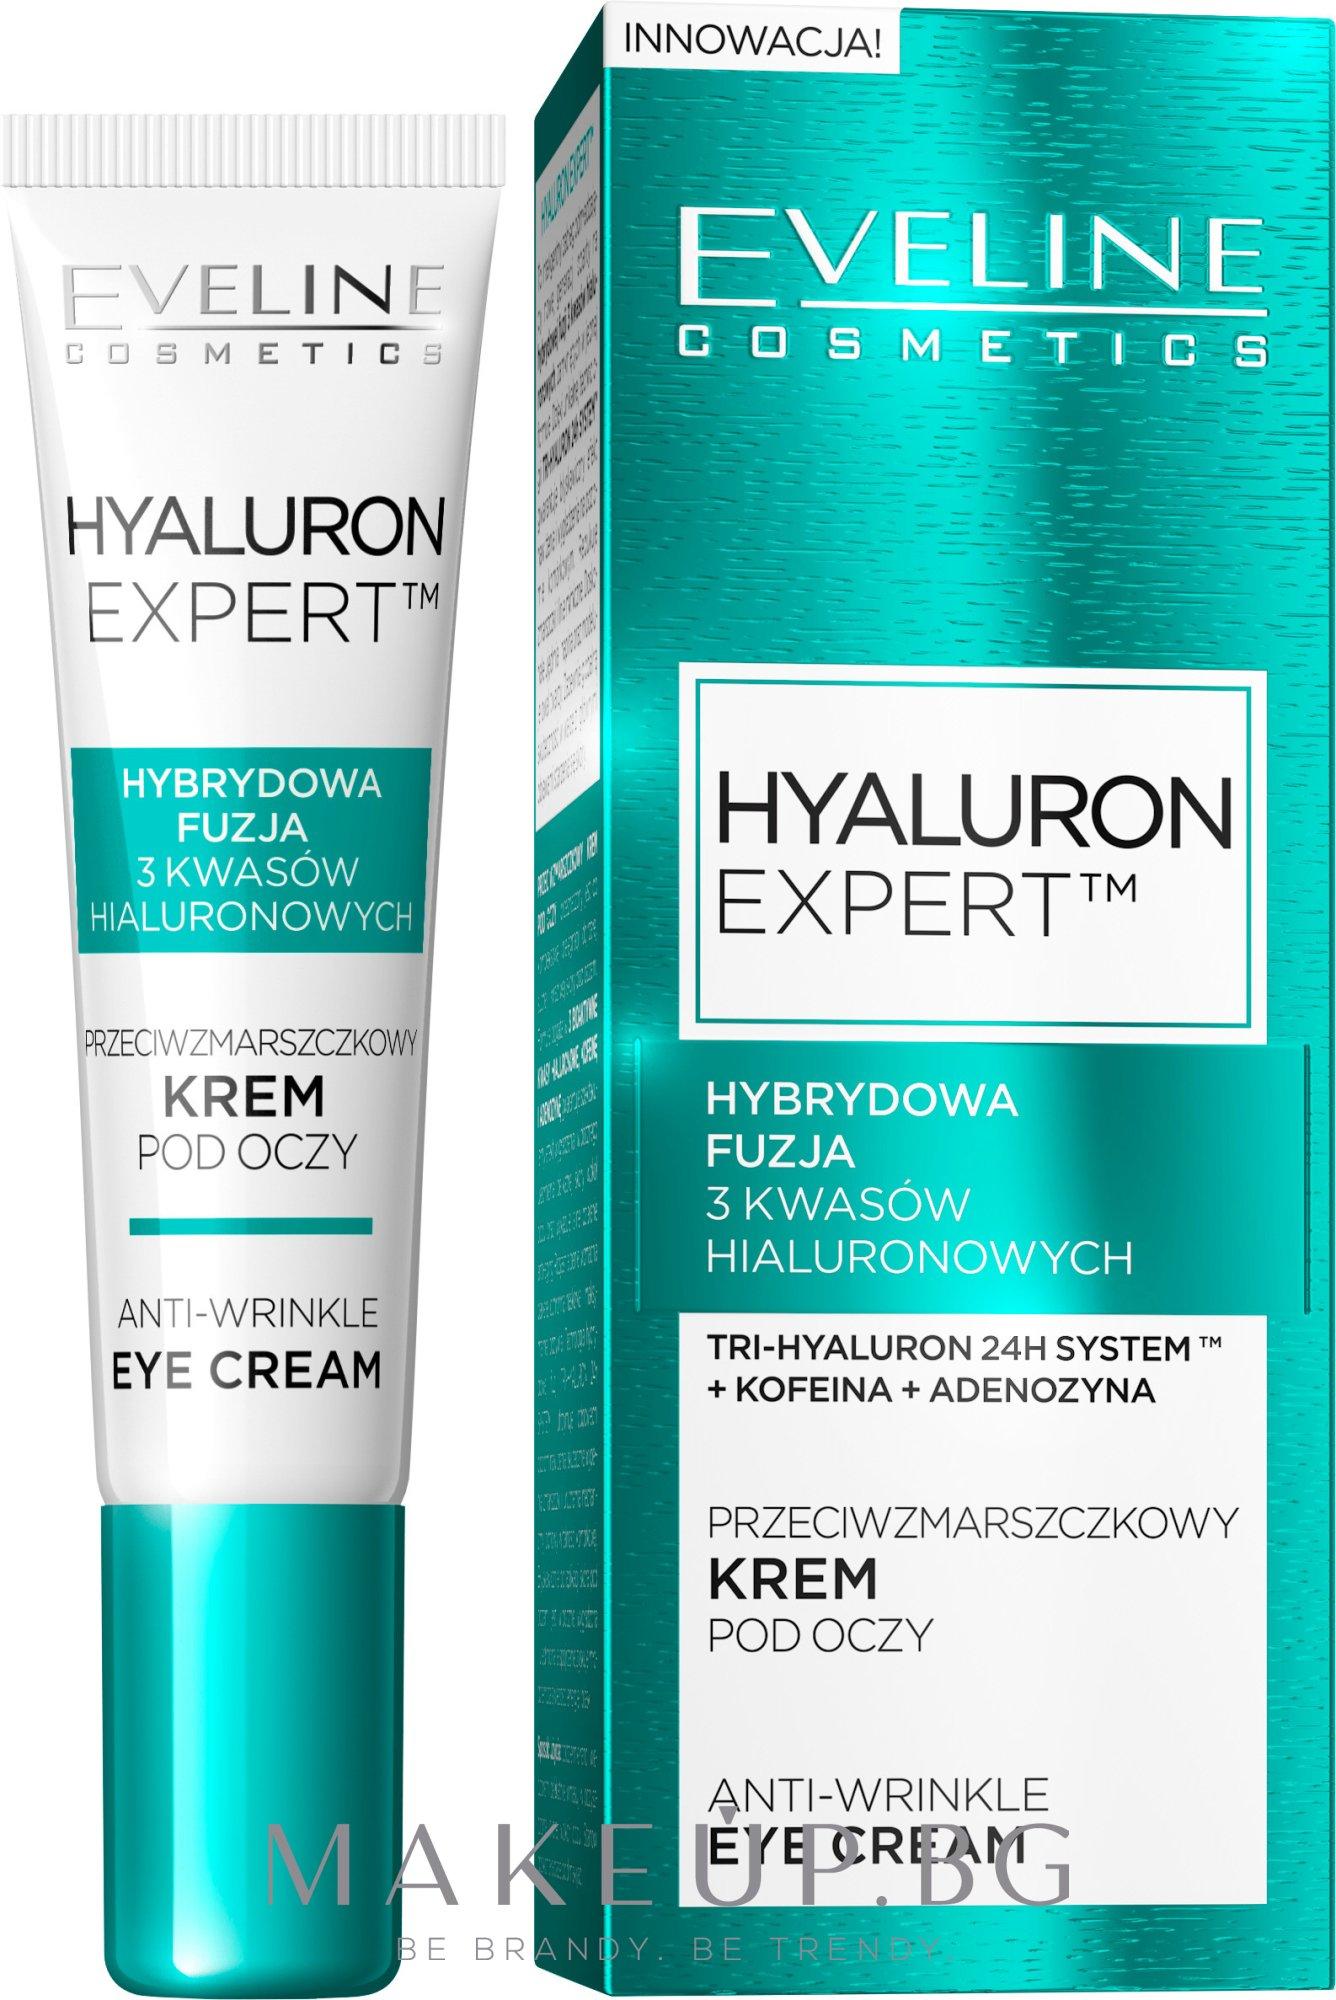 Eveline Cosmetics Hyaluron Expert Anti-Wrinkle Eye Cream..